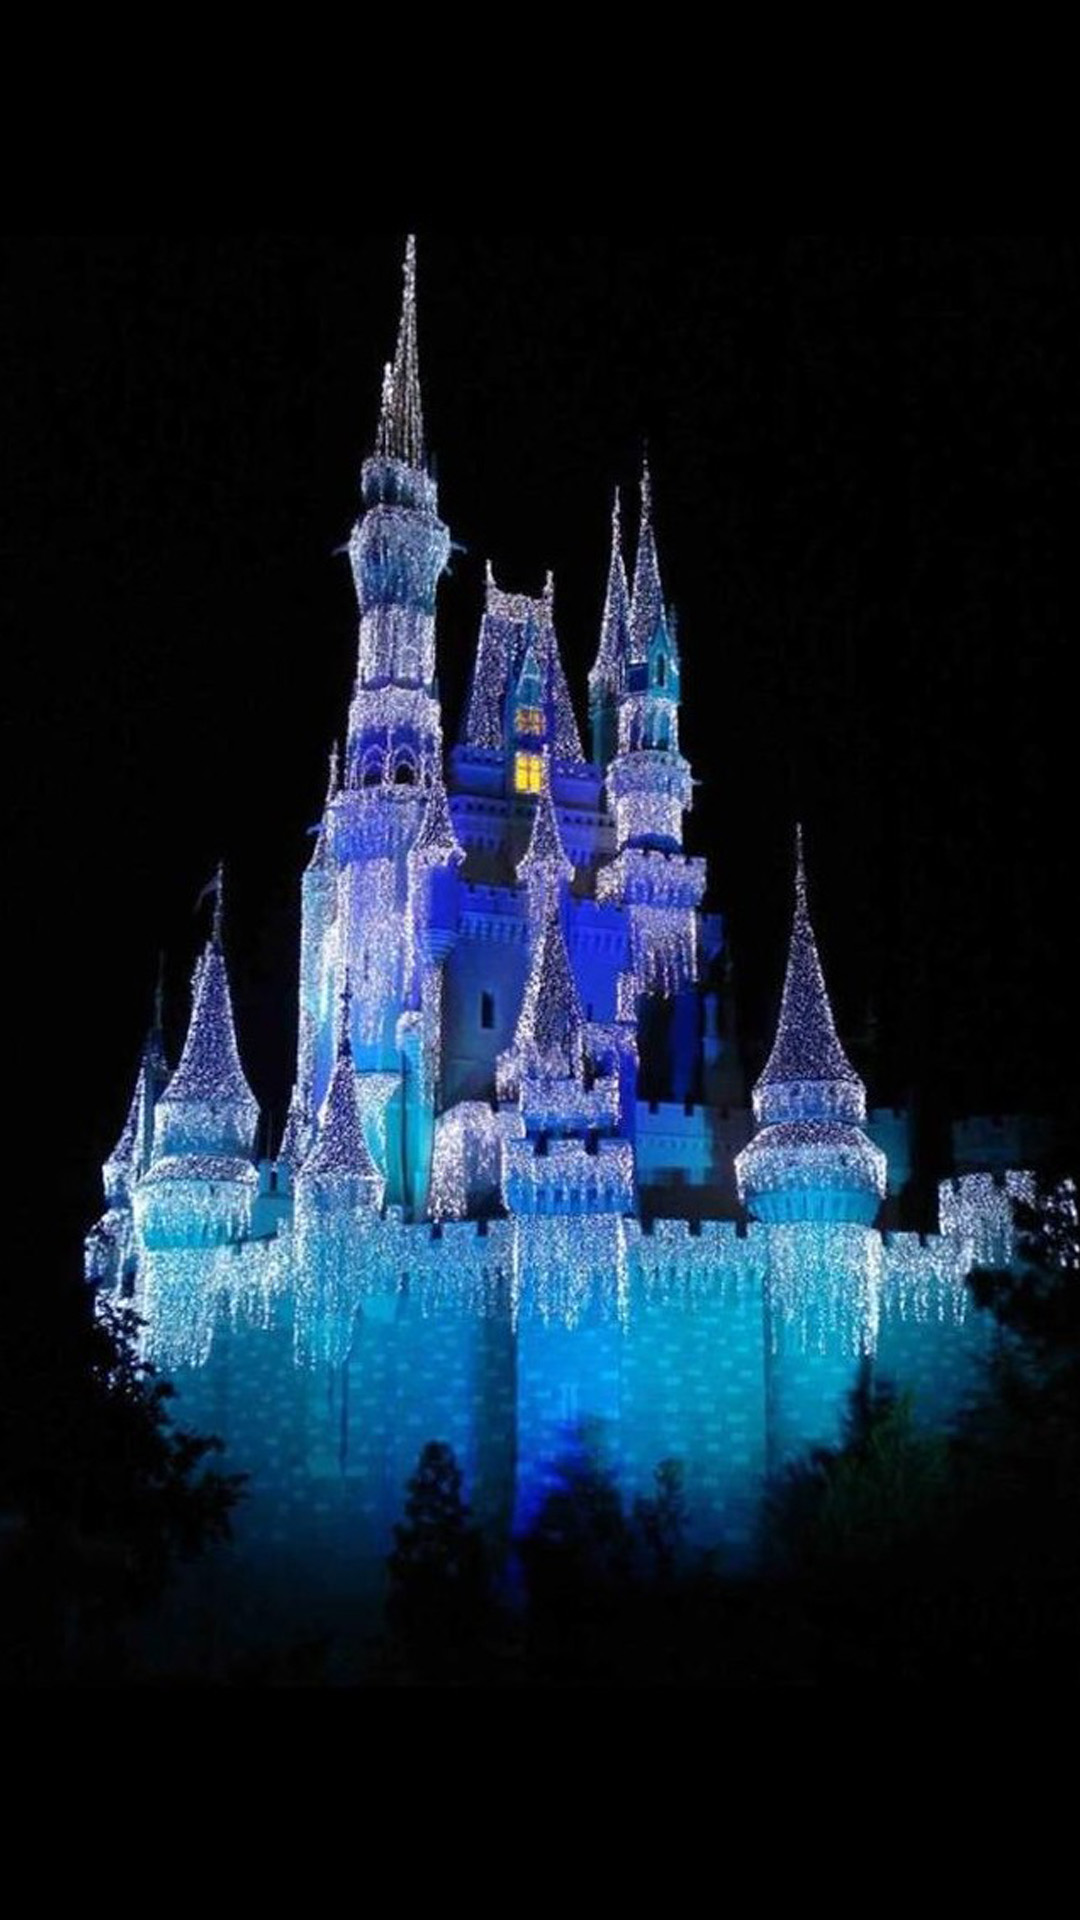 Cute Mickey Wallpapers Free Download Disney Iphone Backgrounds Pixelstalk Net